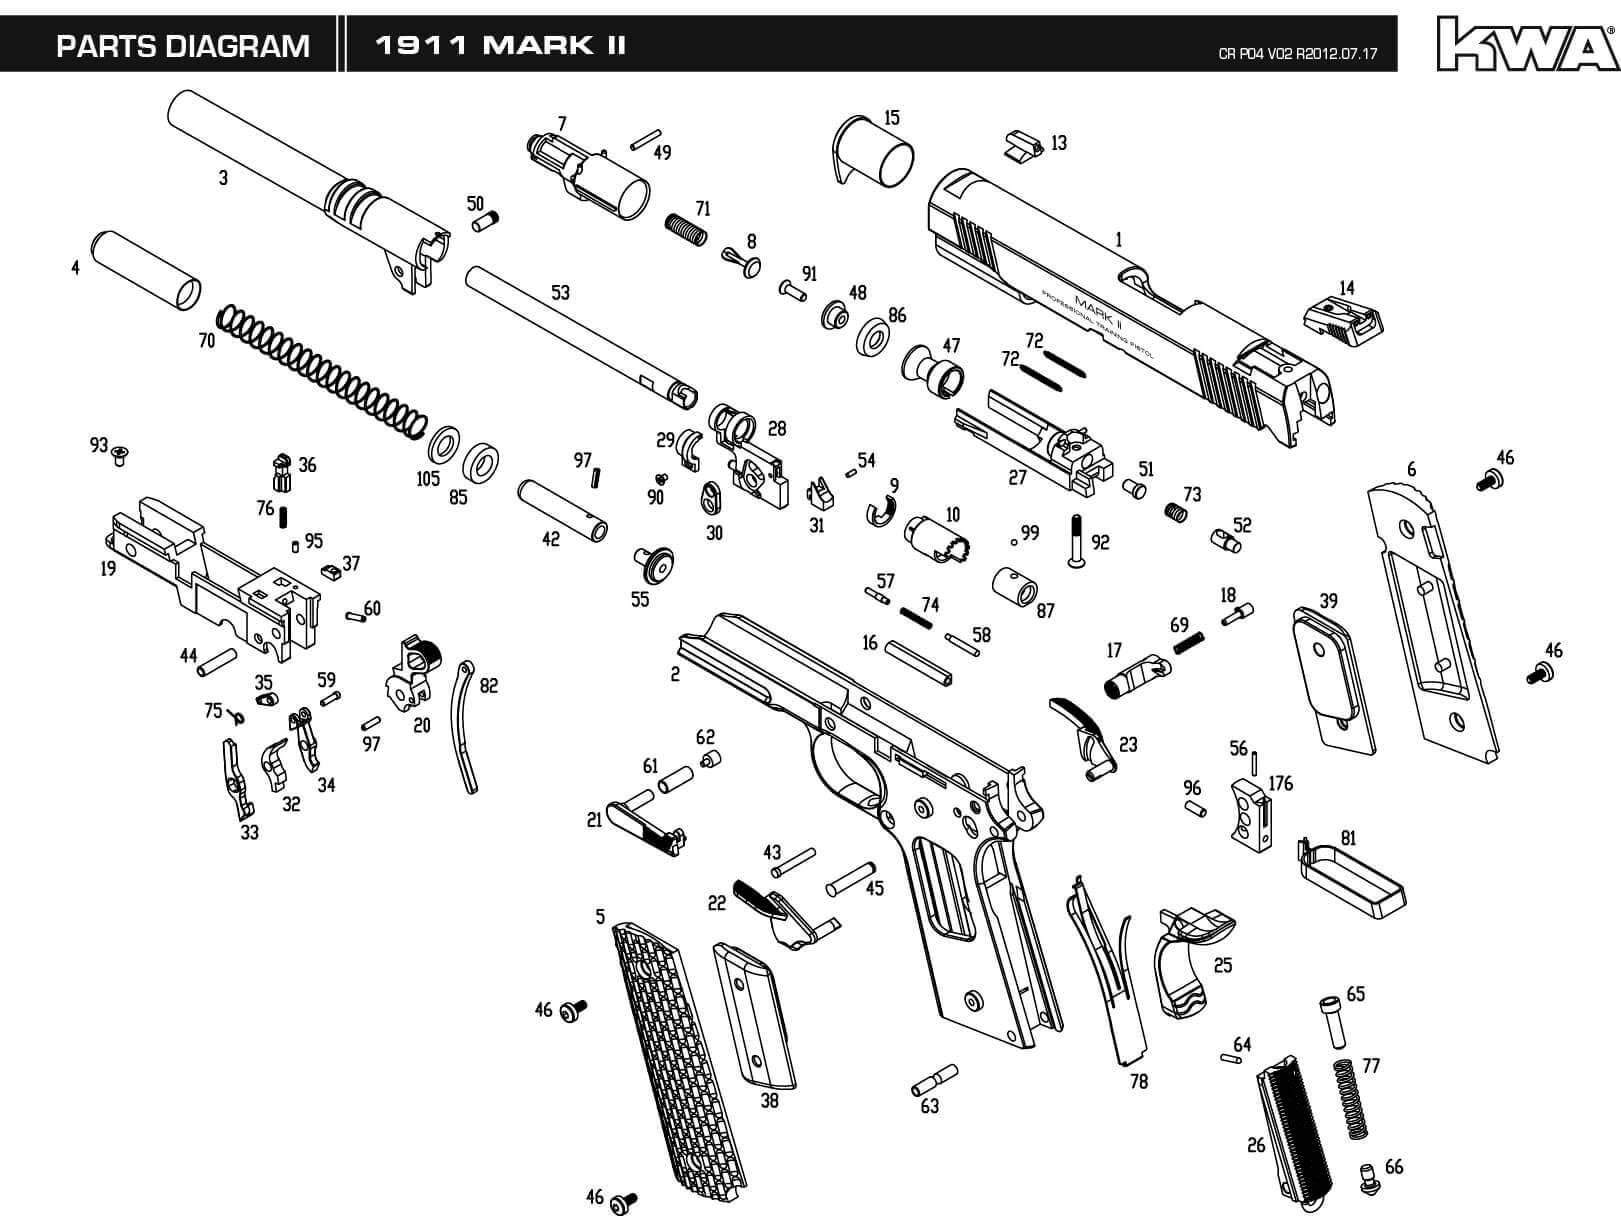 handgun slide parts diagram boat battery charger wiring downloads  kwa airsoft